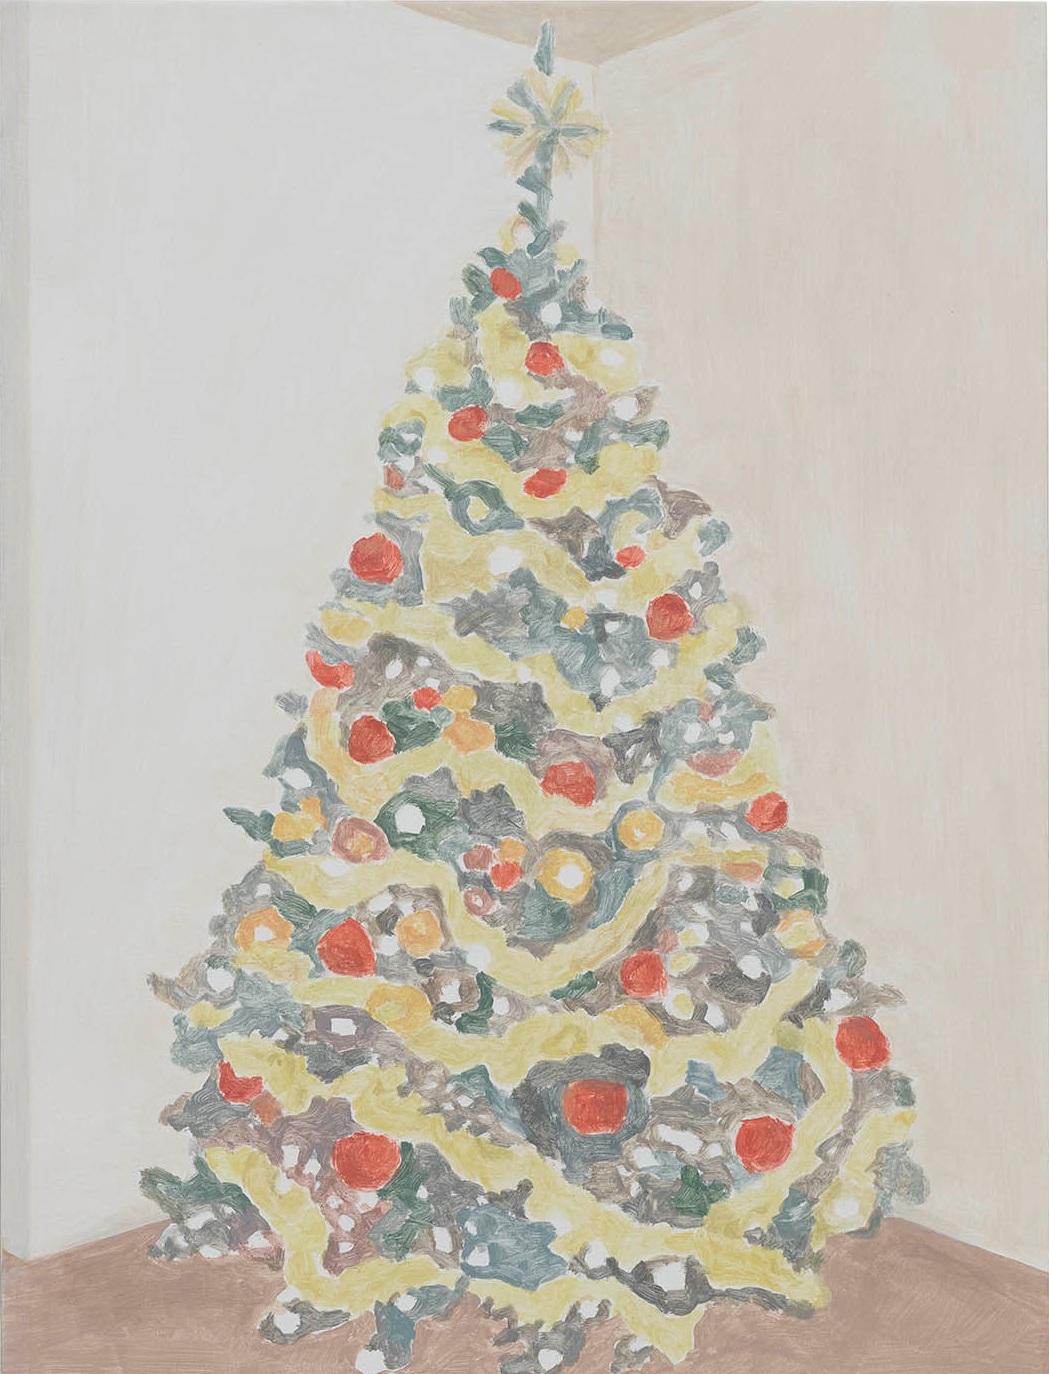 Xmas Tree (garland), acrylic on canvas, 32 x 24.25 inches, 2016.